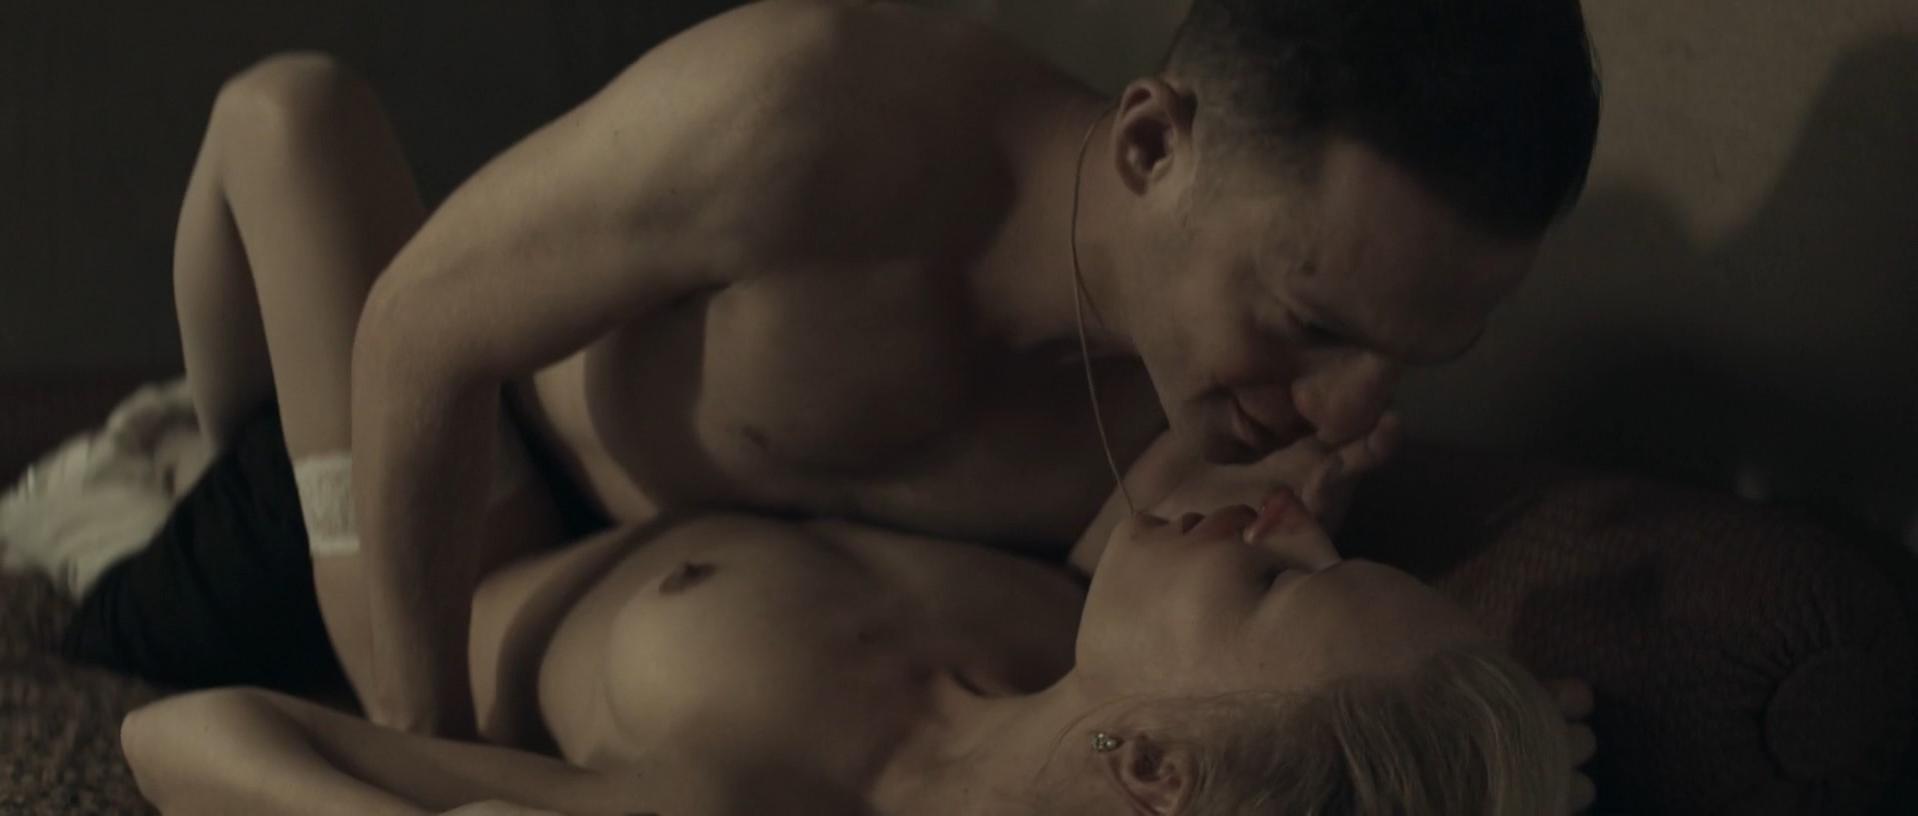 Agnieszka pawelkiewicz naked full frontal sex scenes oldampyoung doggy 7